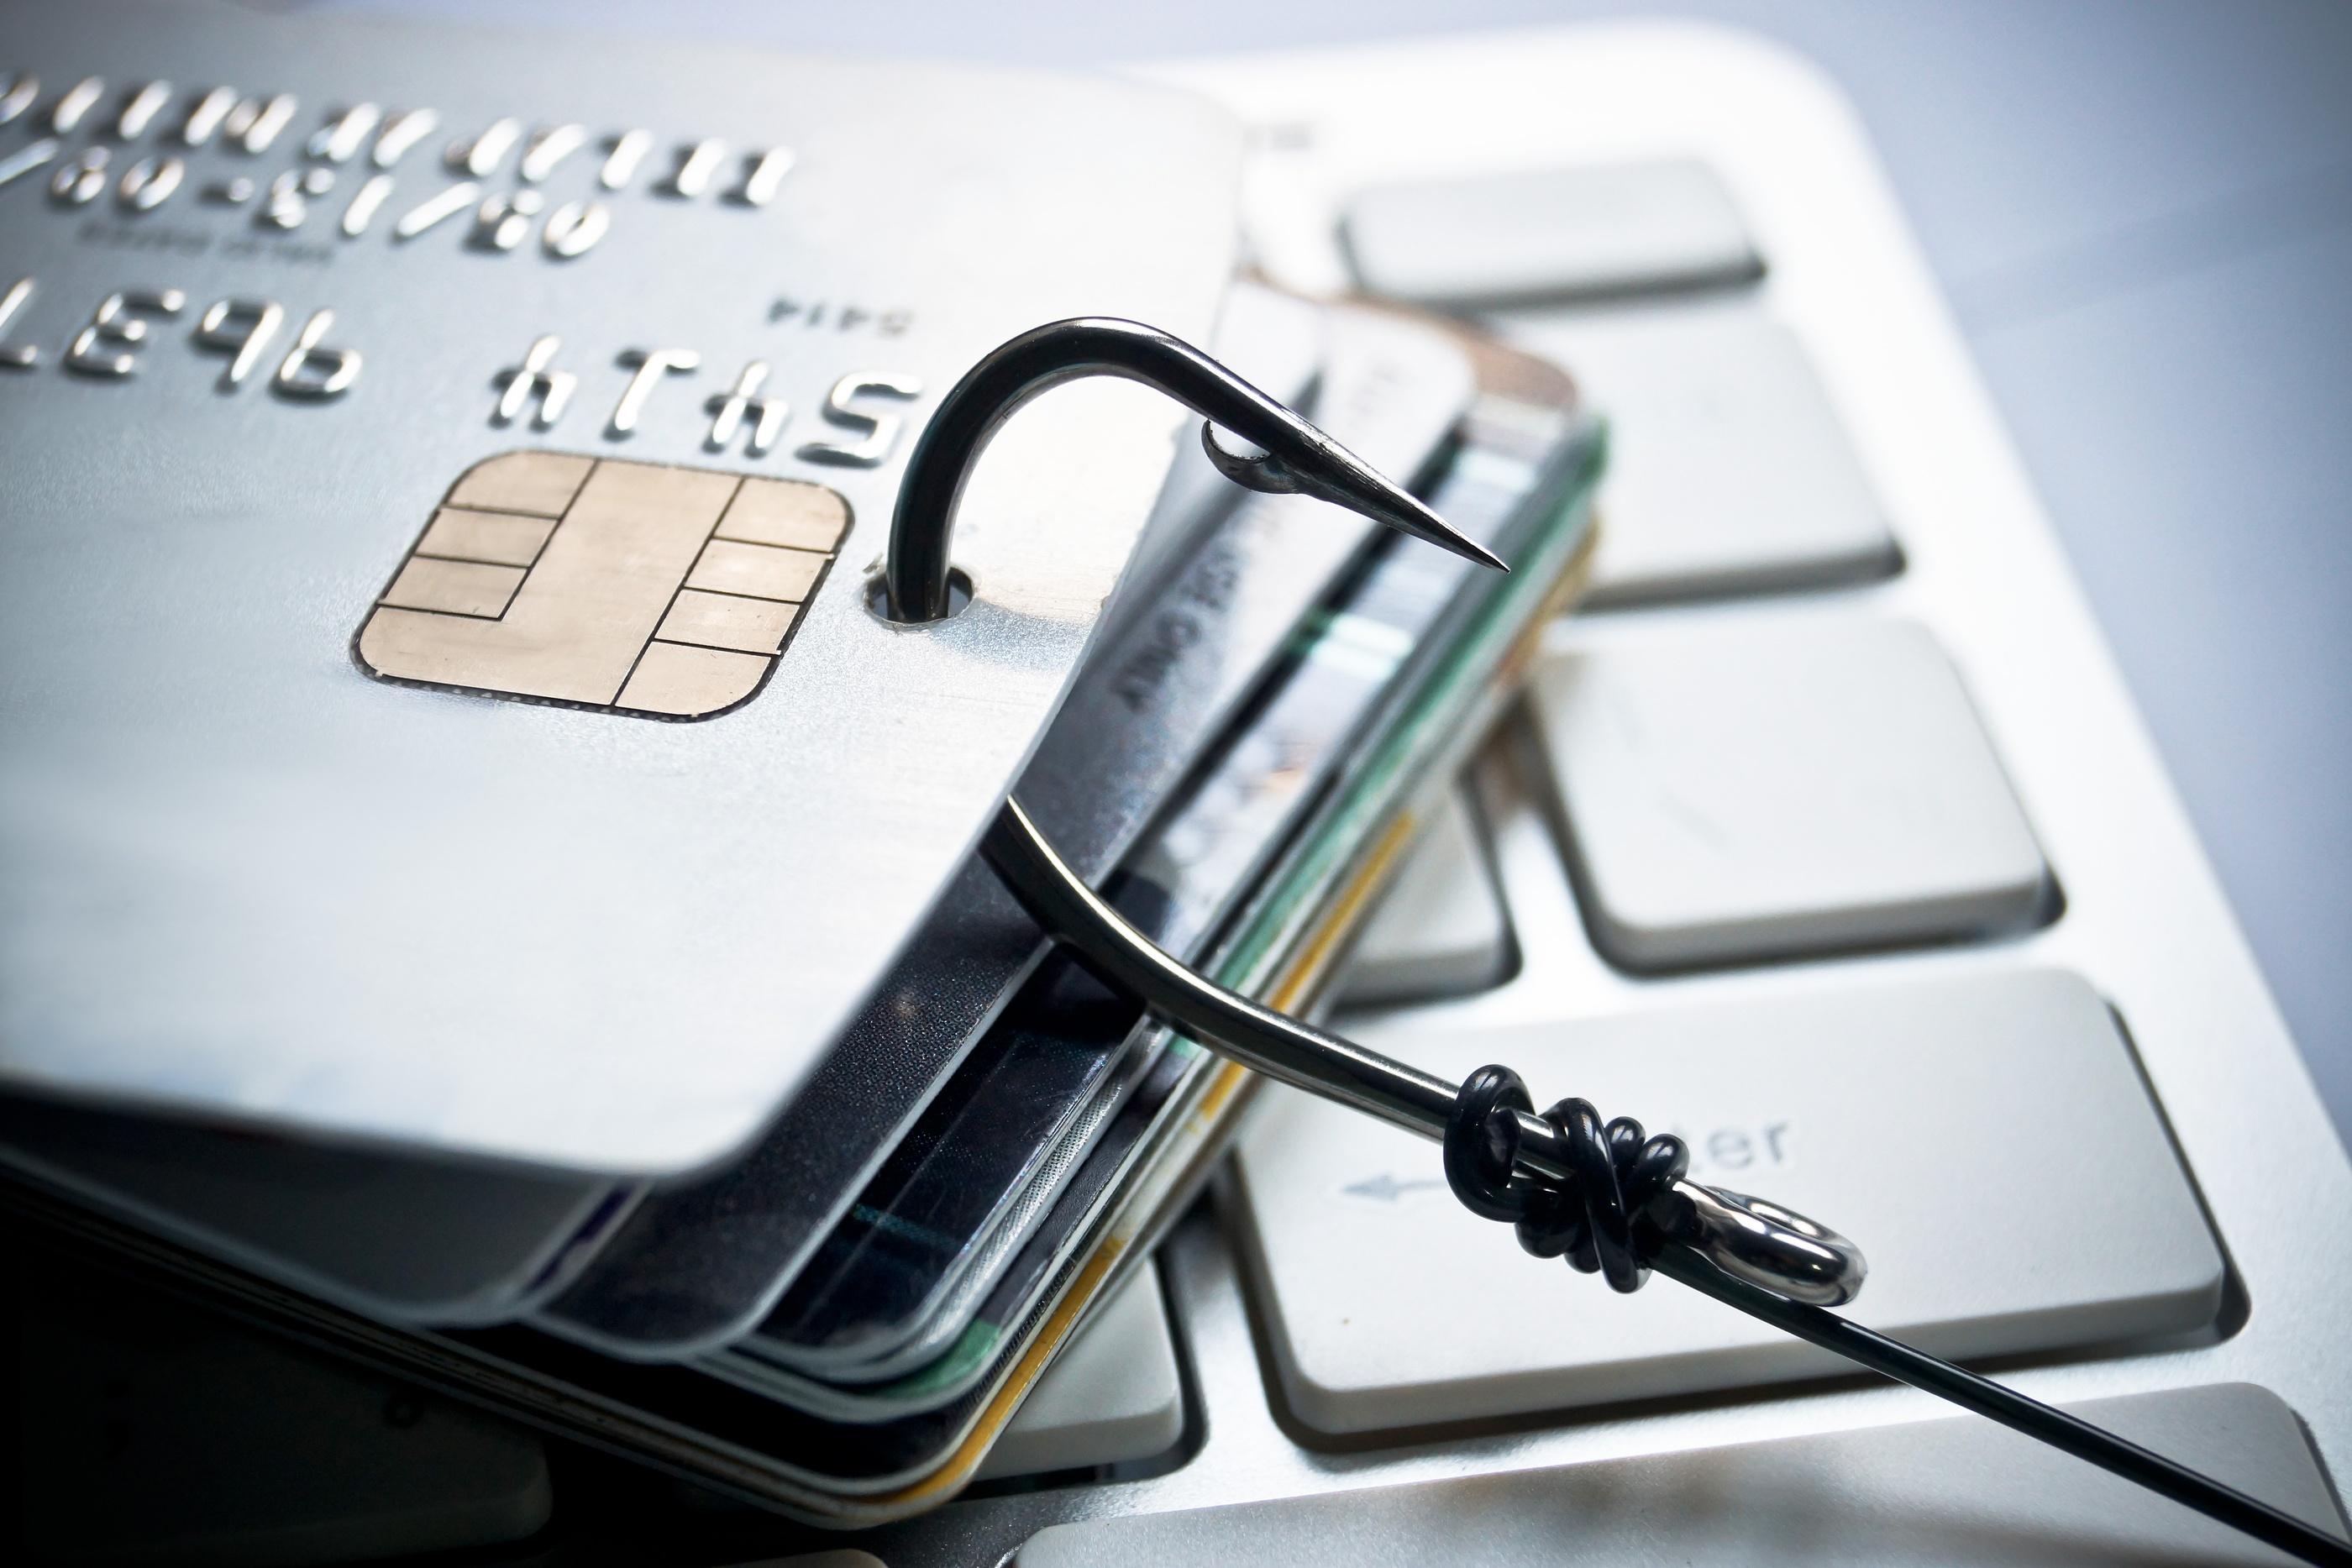 bigstock-credit-card-data-theft-75494917.jpg